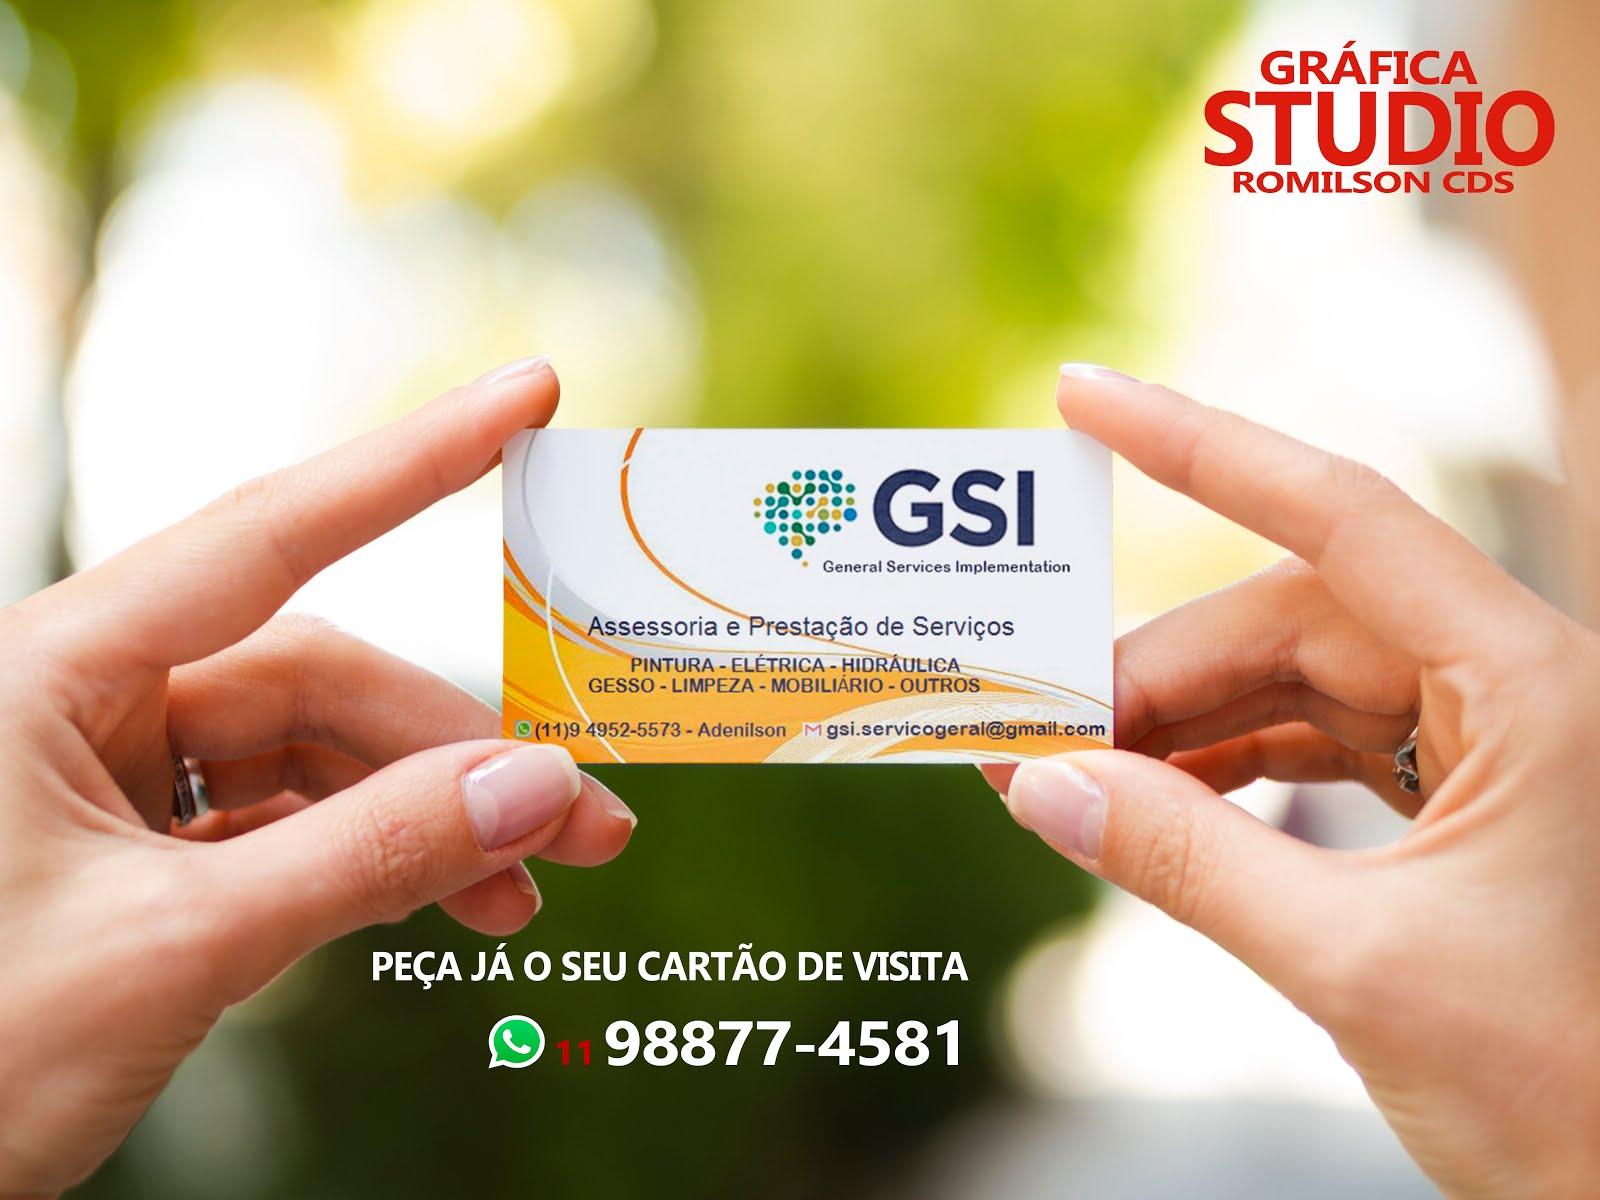 GRÁFICA STUDIO ROMILSON CDS